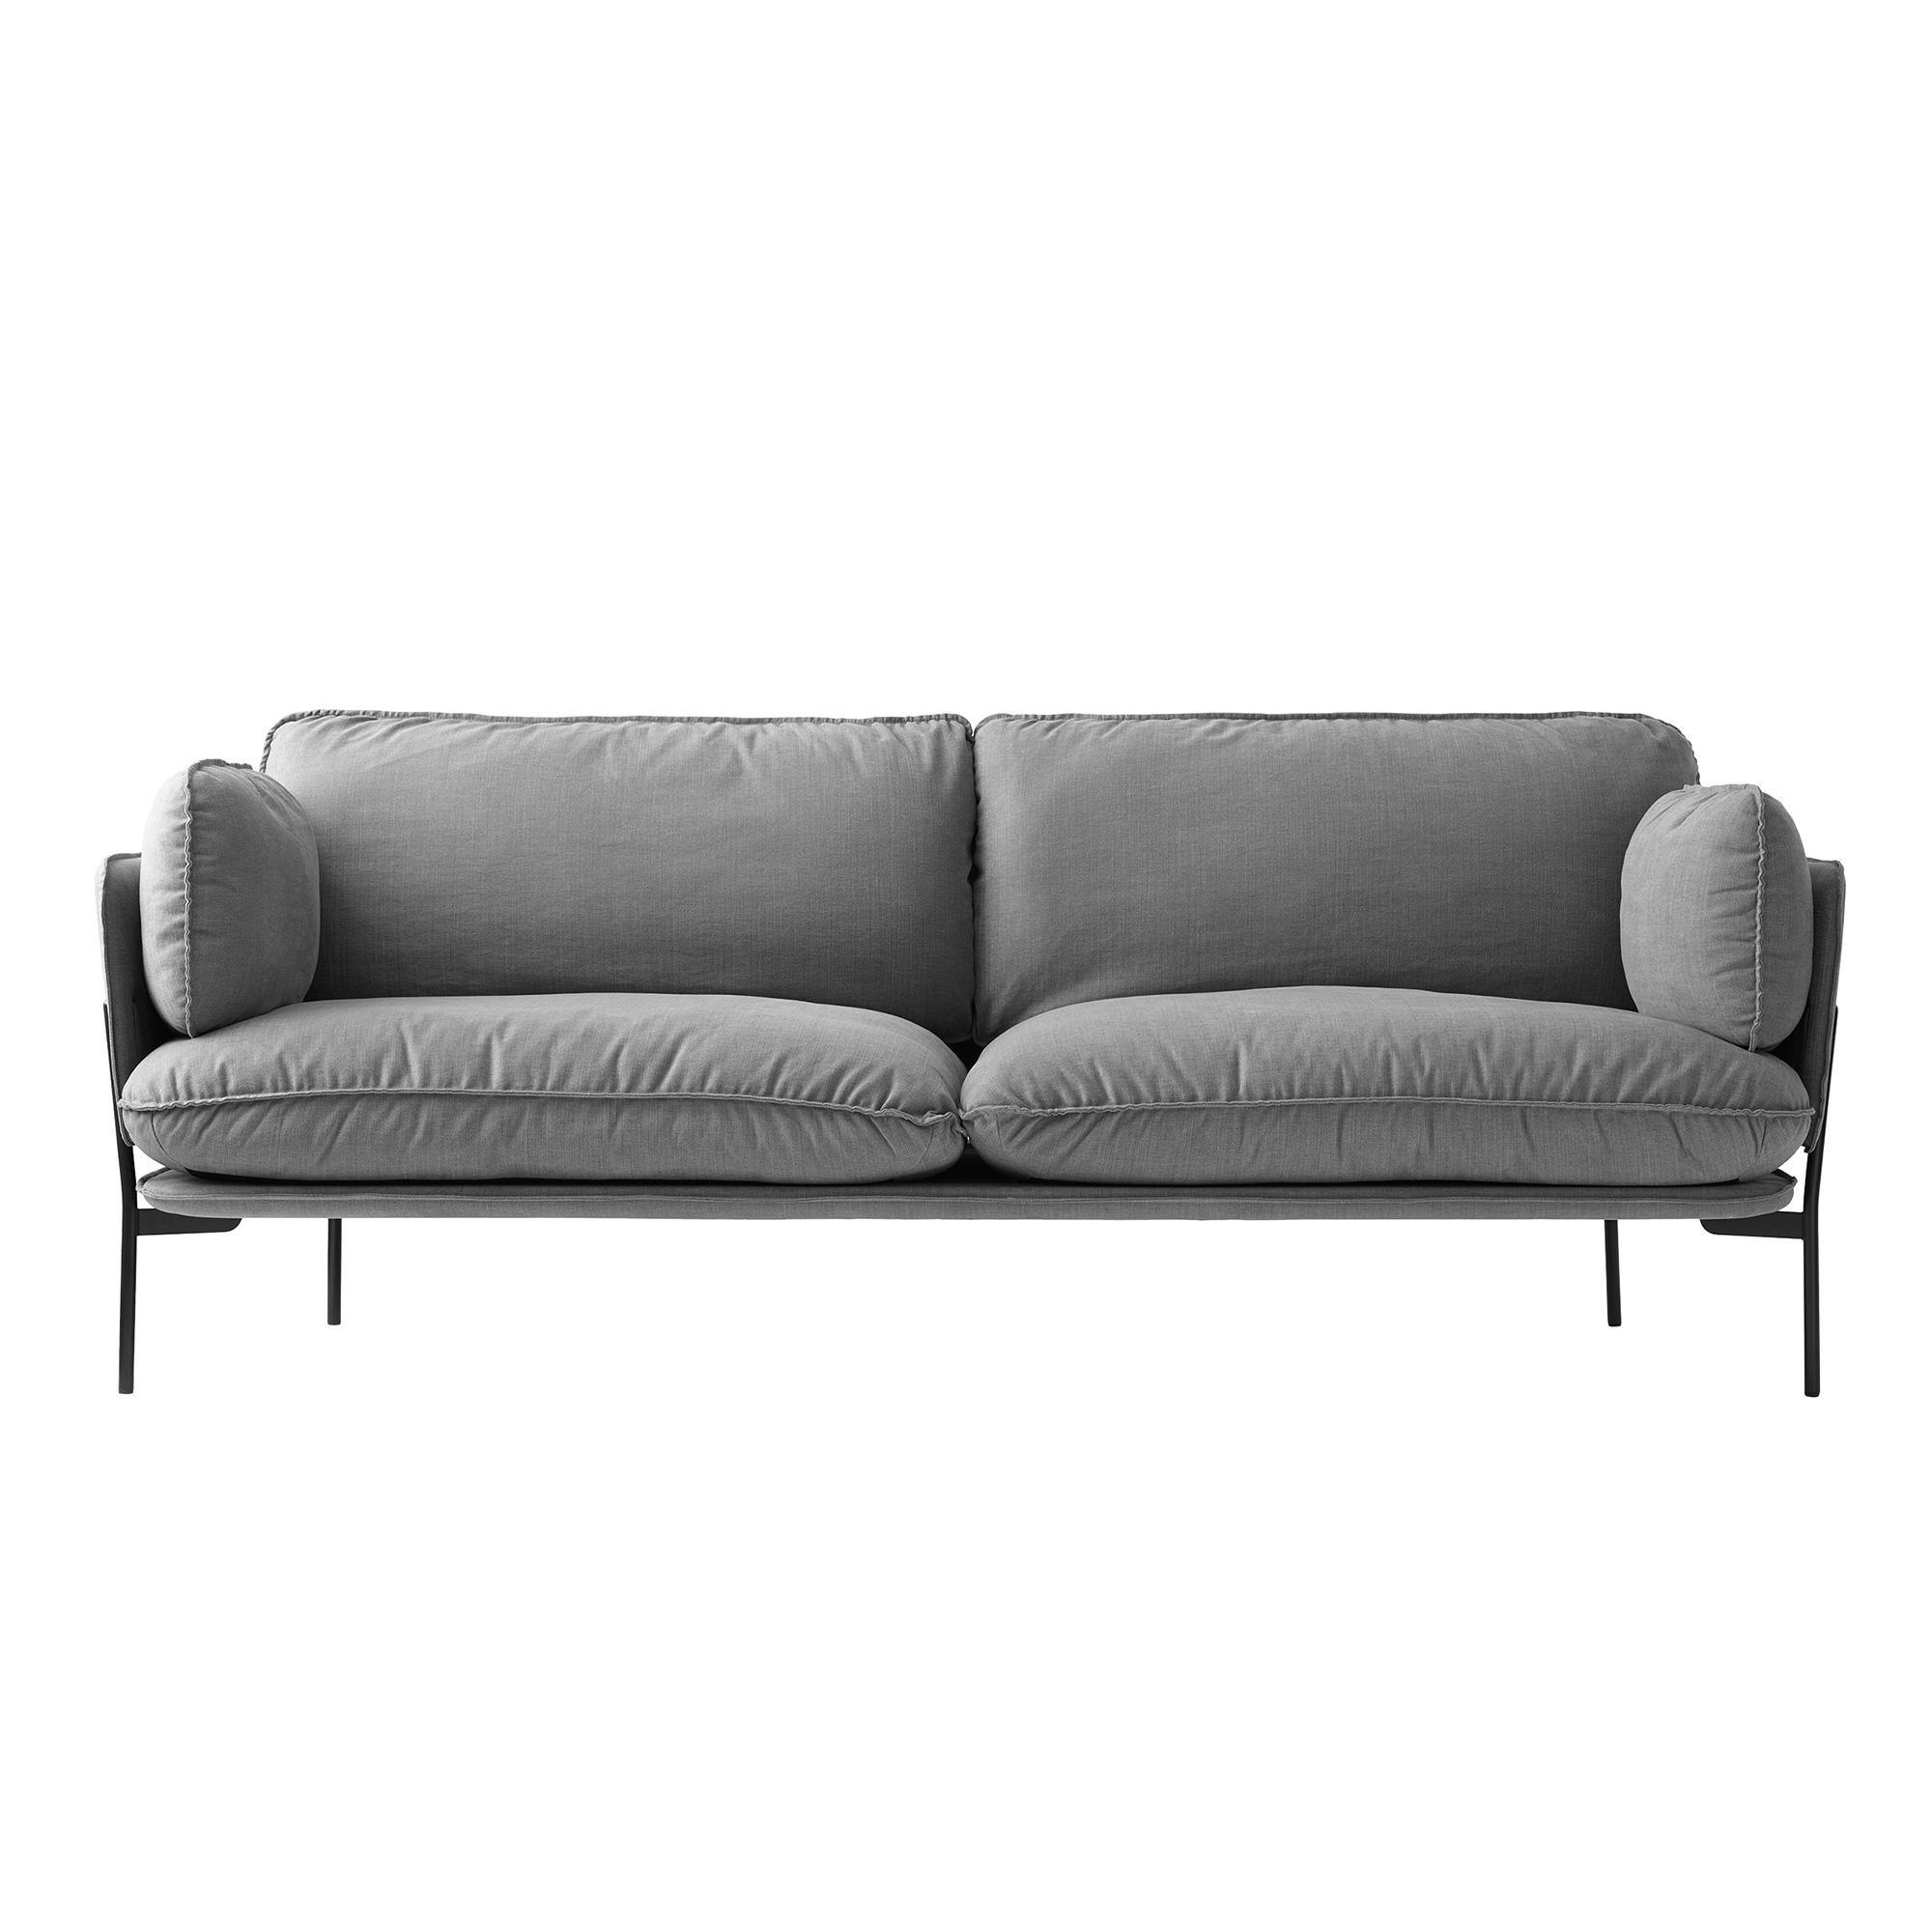 Full Size of Sofa 3 Sitzer Grau Leder Ikea Couch Samt Rattan 3 Sitzer Nino Schwarz/grau Tradition Cloud Ln32 Ambientedirect Boxspring Bezug Ecksofa Englisches Günstig Sofa Sofa 3 Sitzer Grau